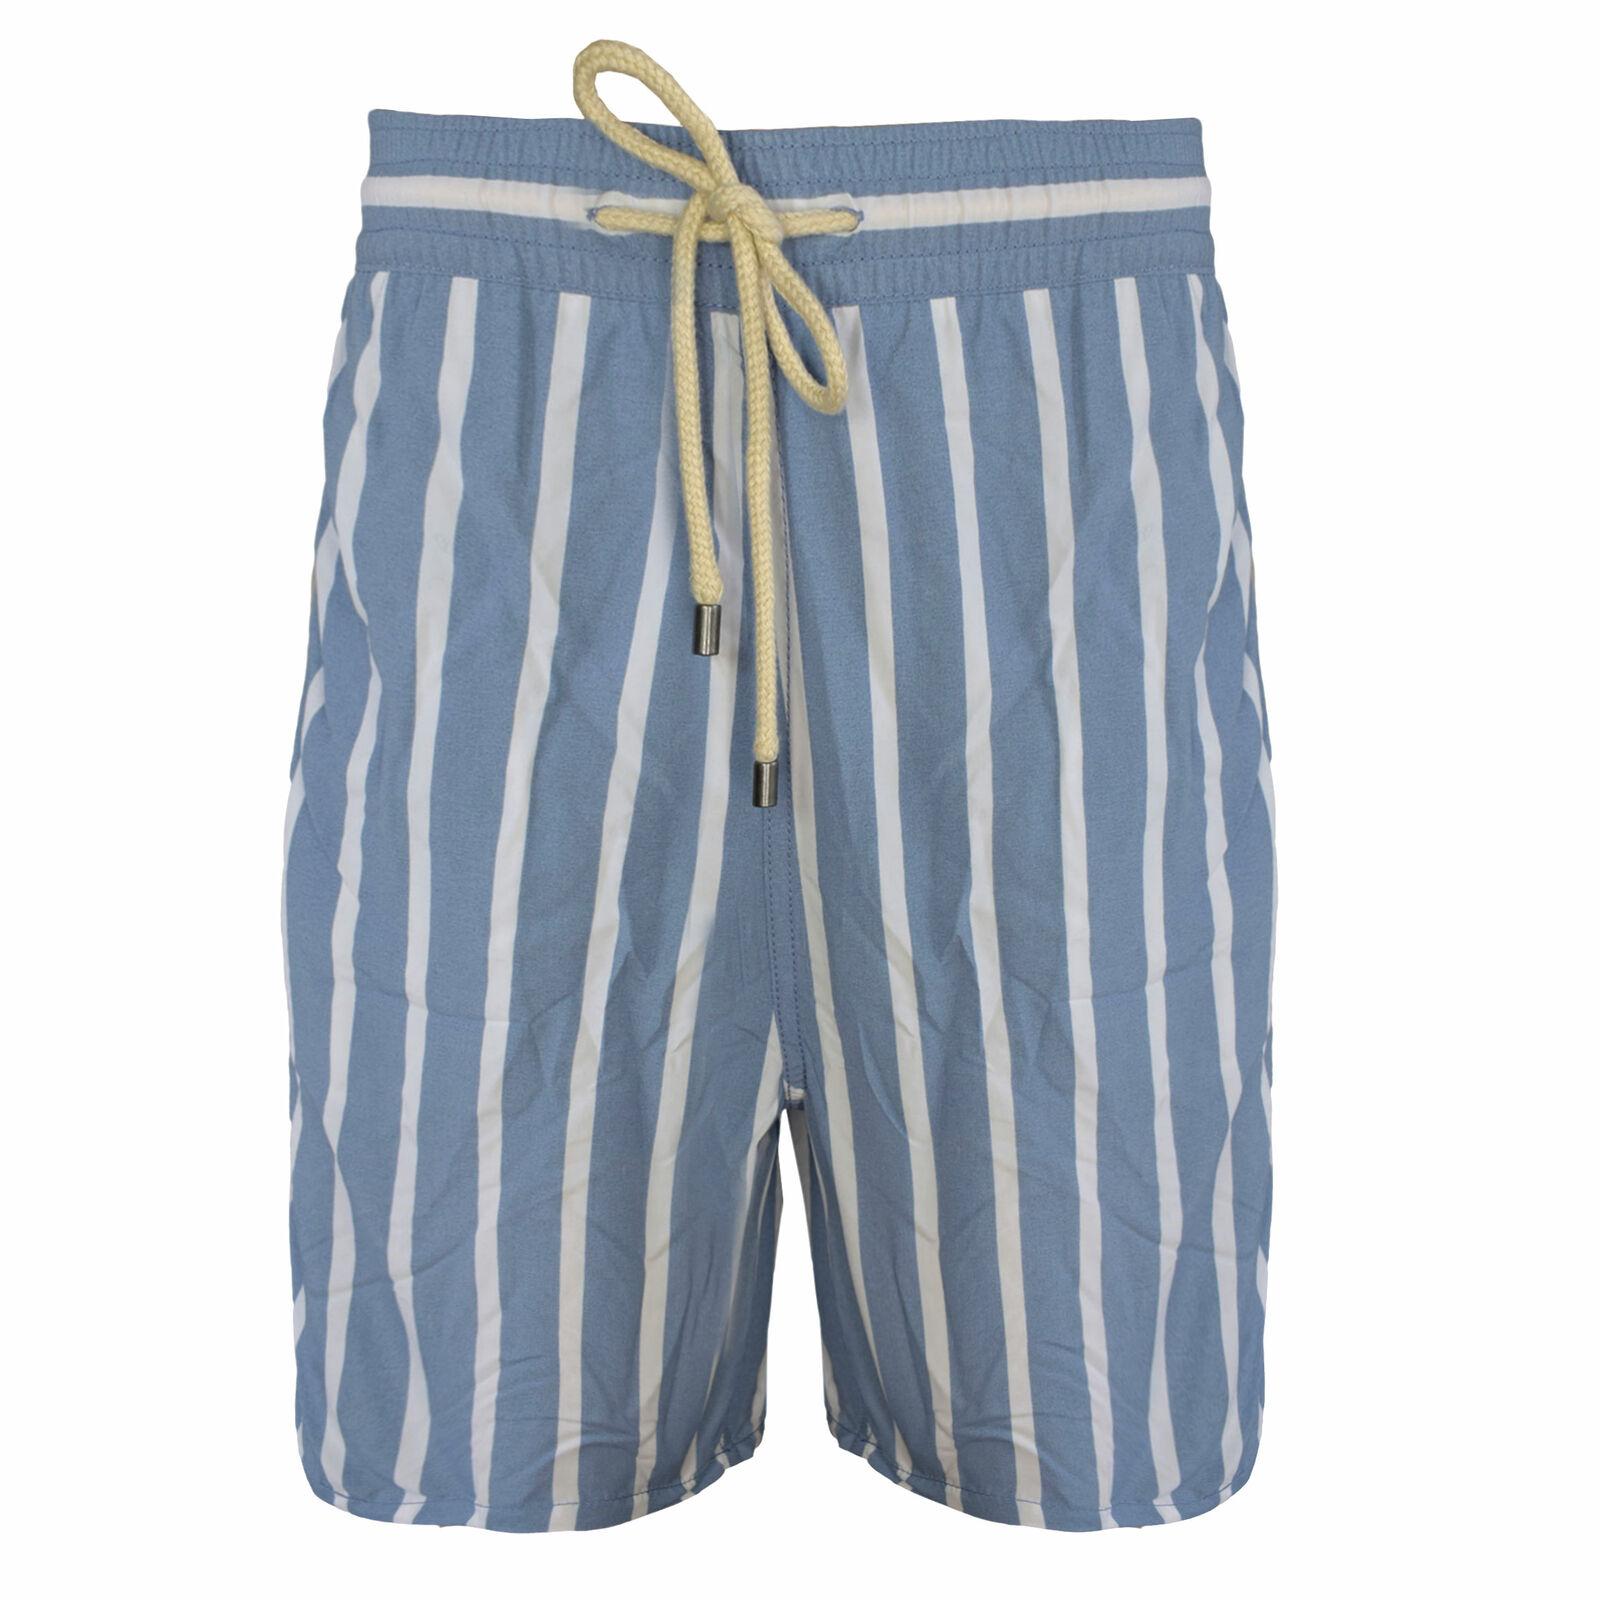 Solid & Striped Men's The Classic Swim Trunks, Steel bluee White